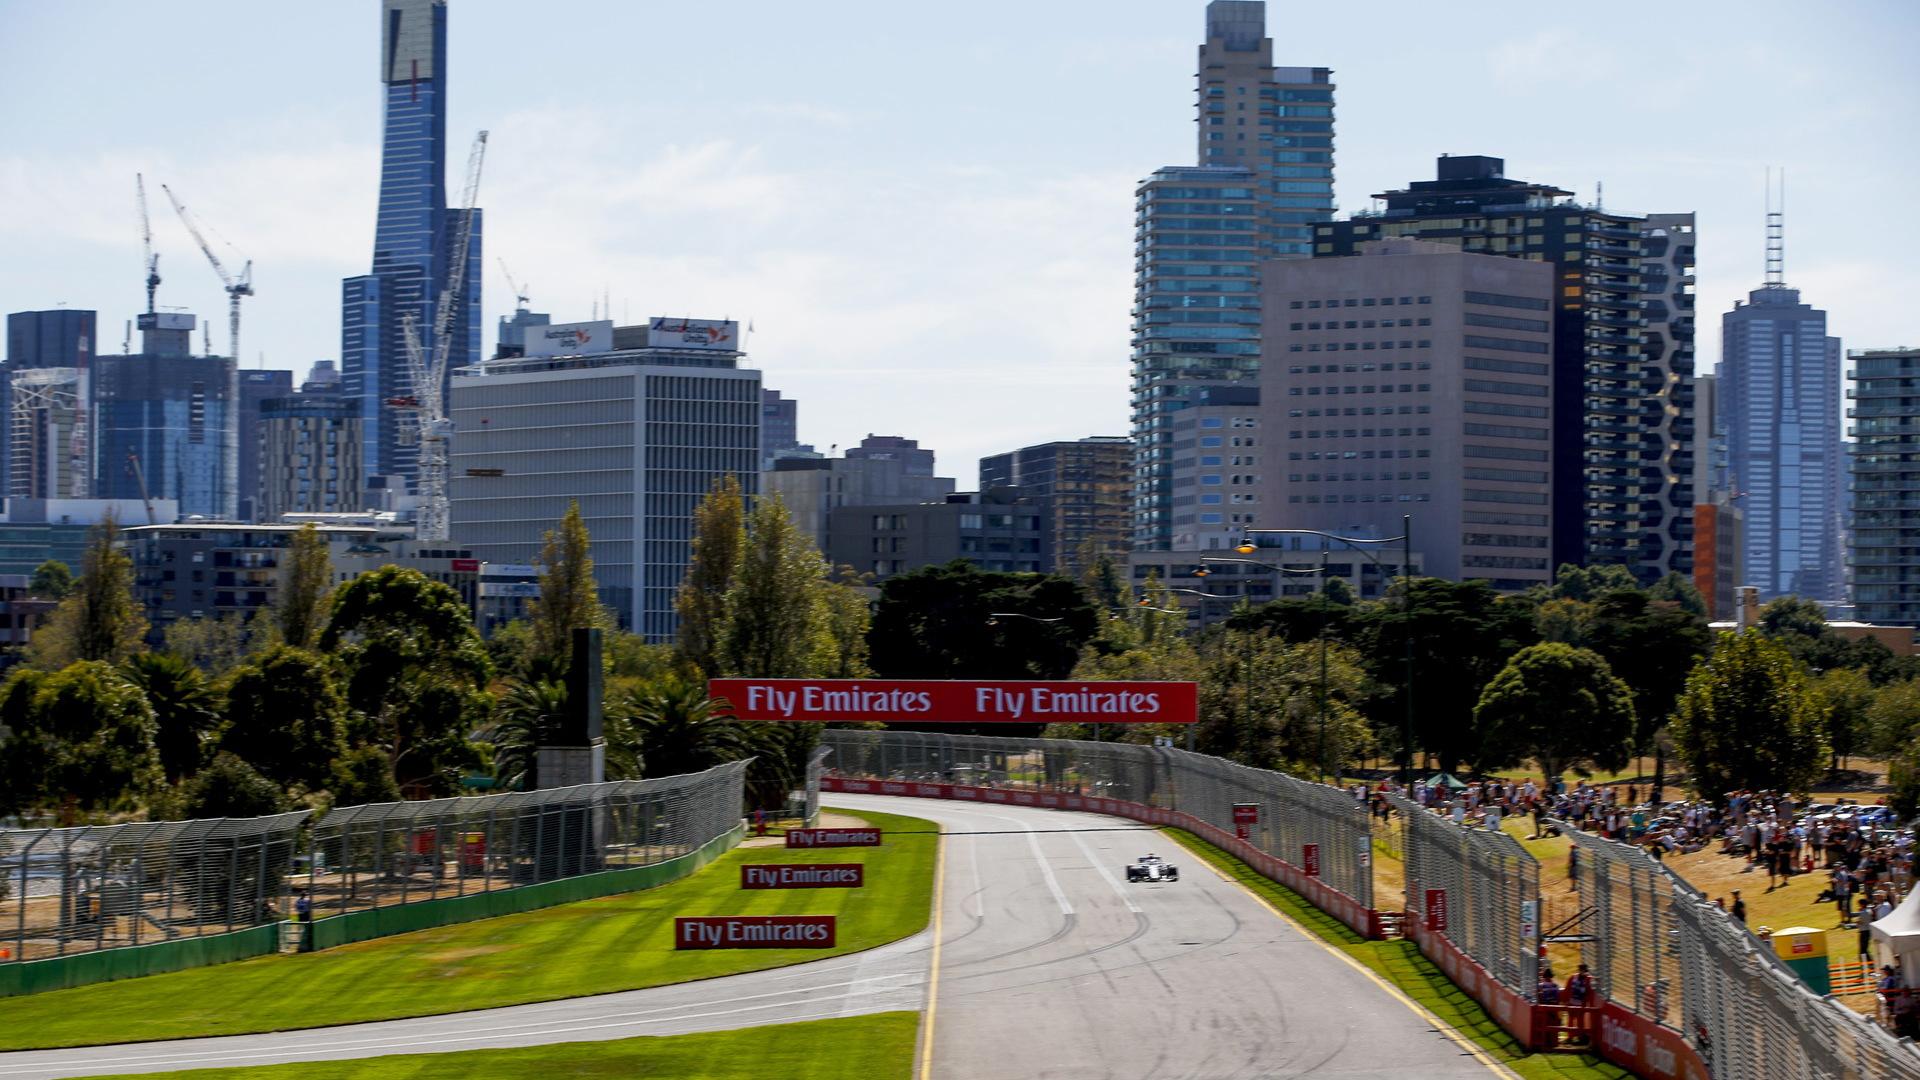 Melbourne Grand Prix Circuit, home of the Formula 1 Australian Grand Prix